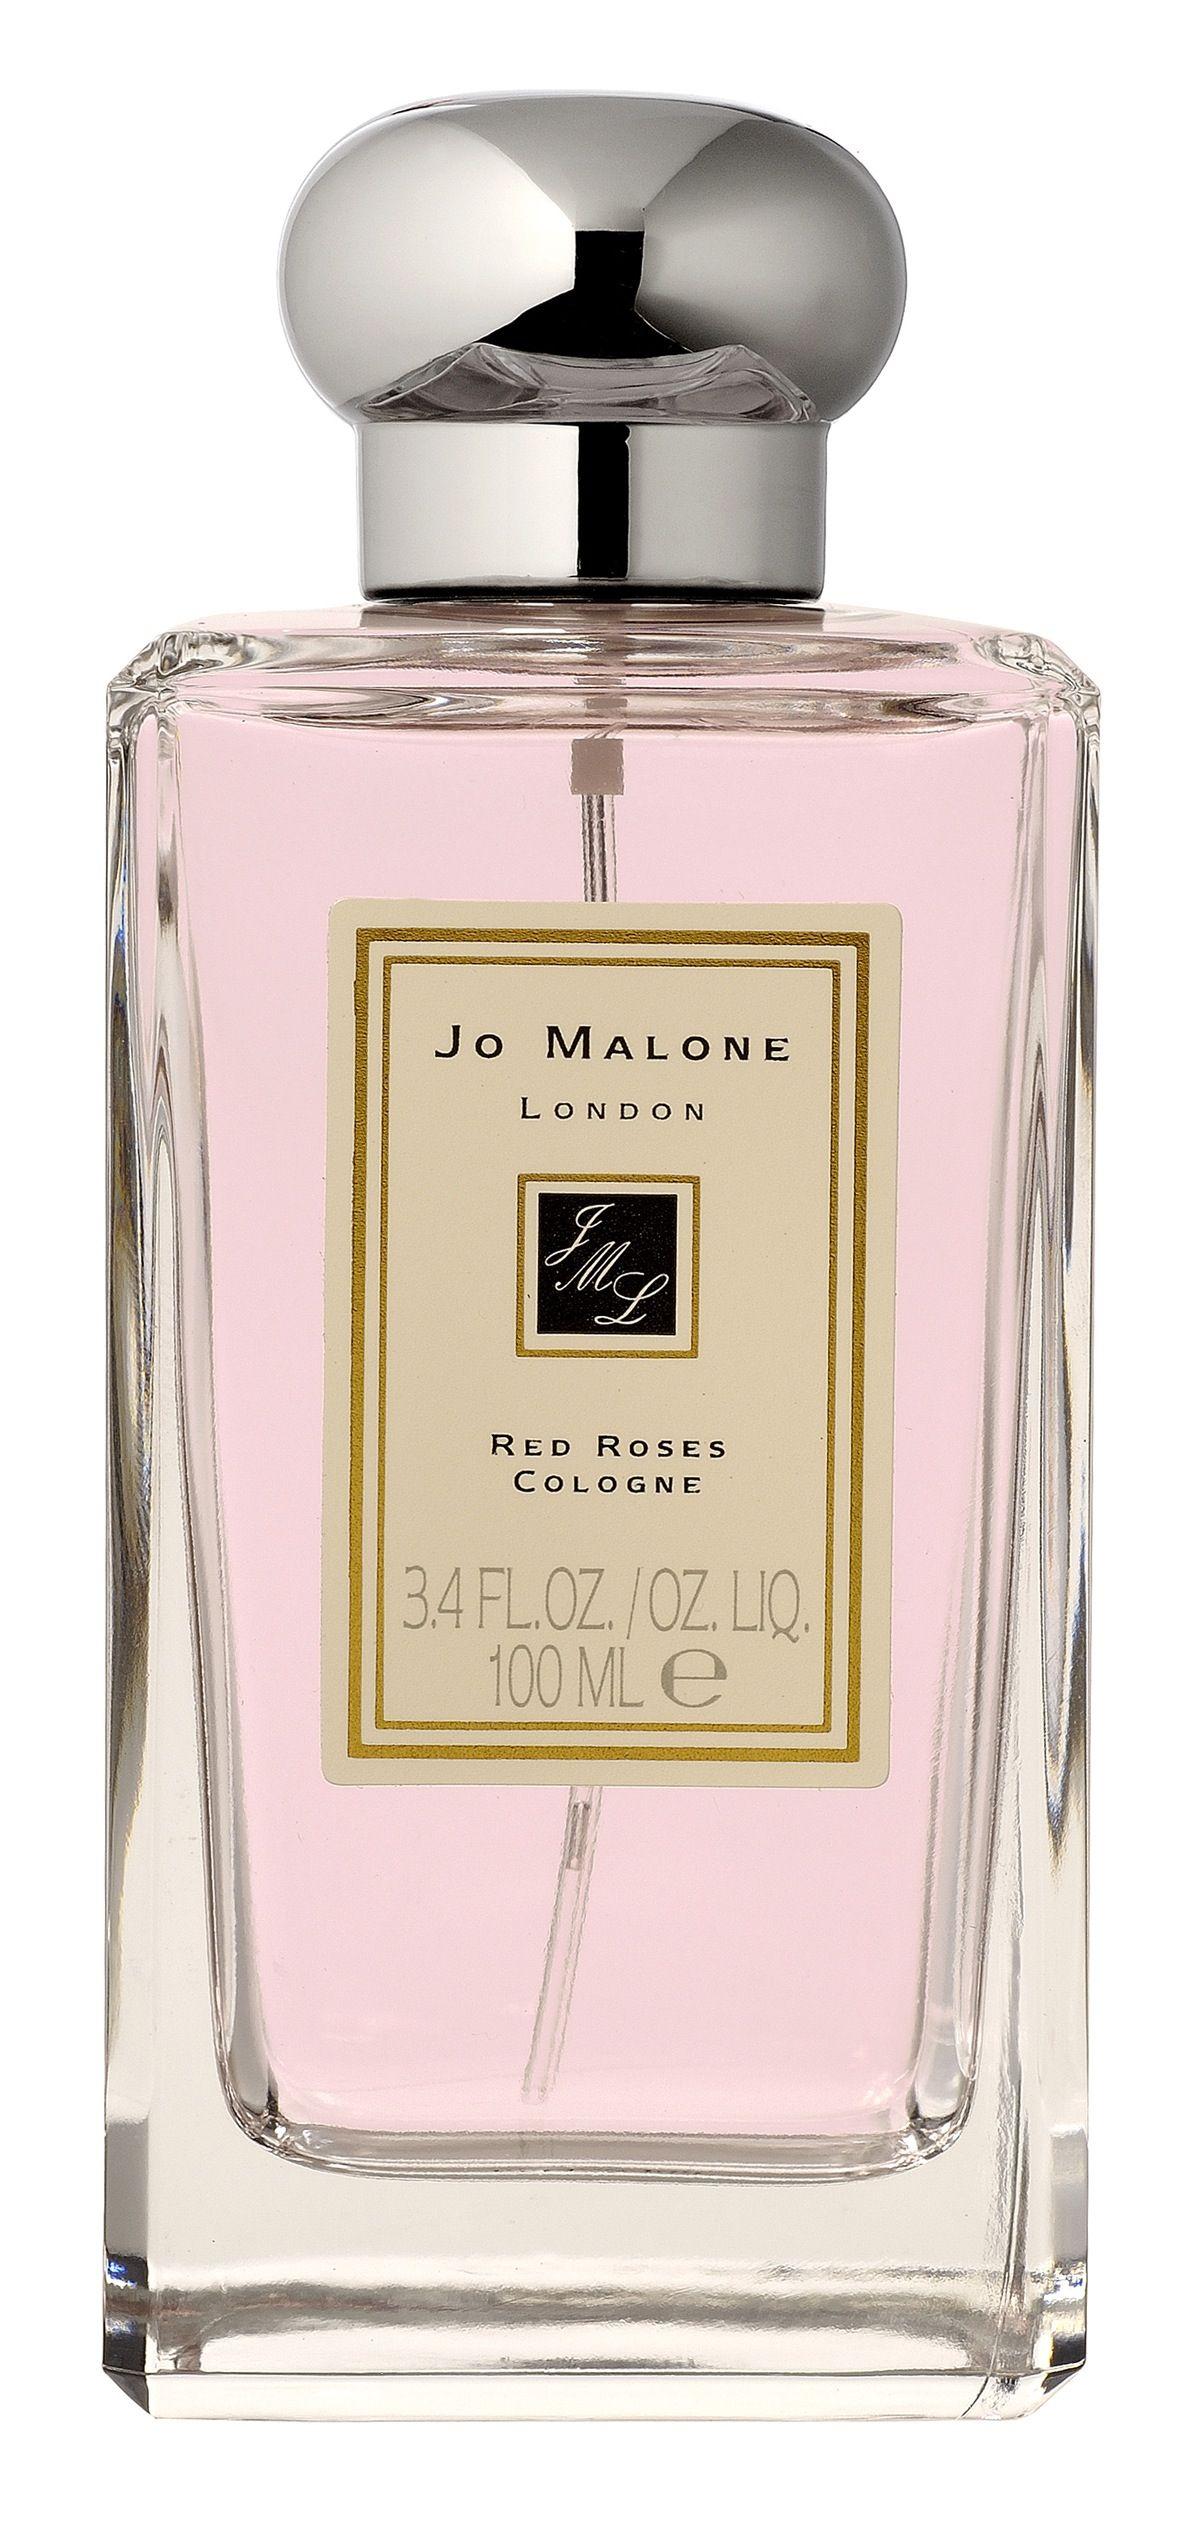 Red Roses от Jo Malone 10 Лучших Женских Ароматов 2012